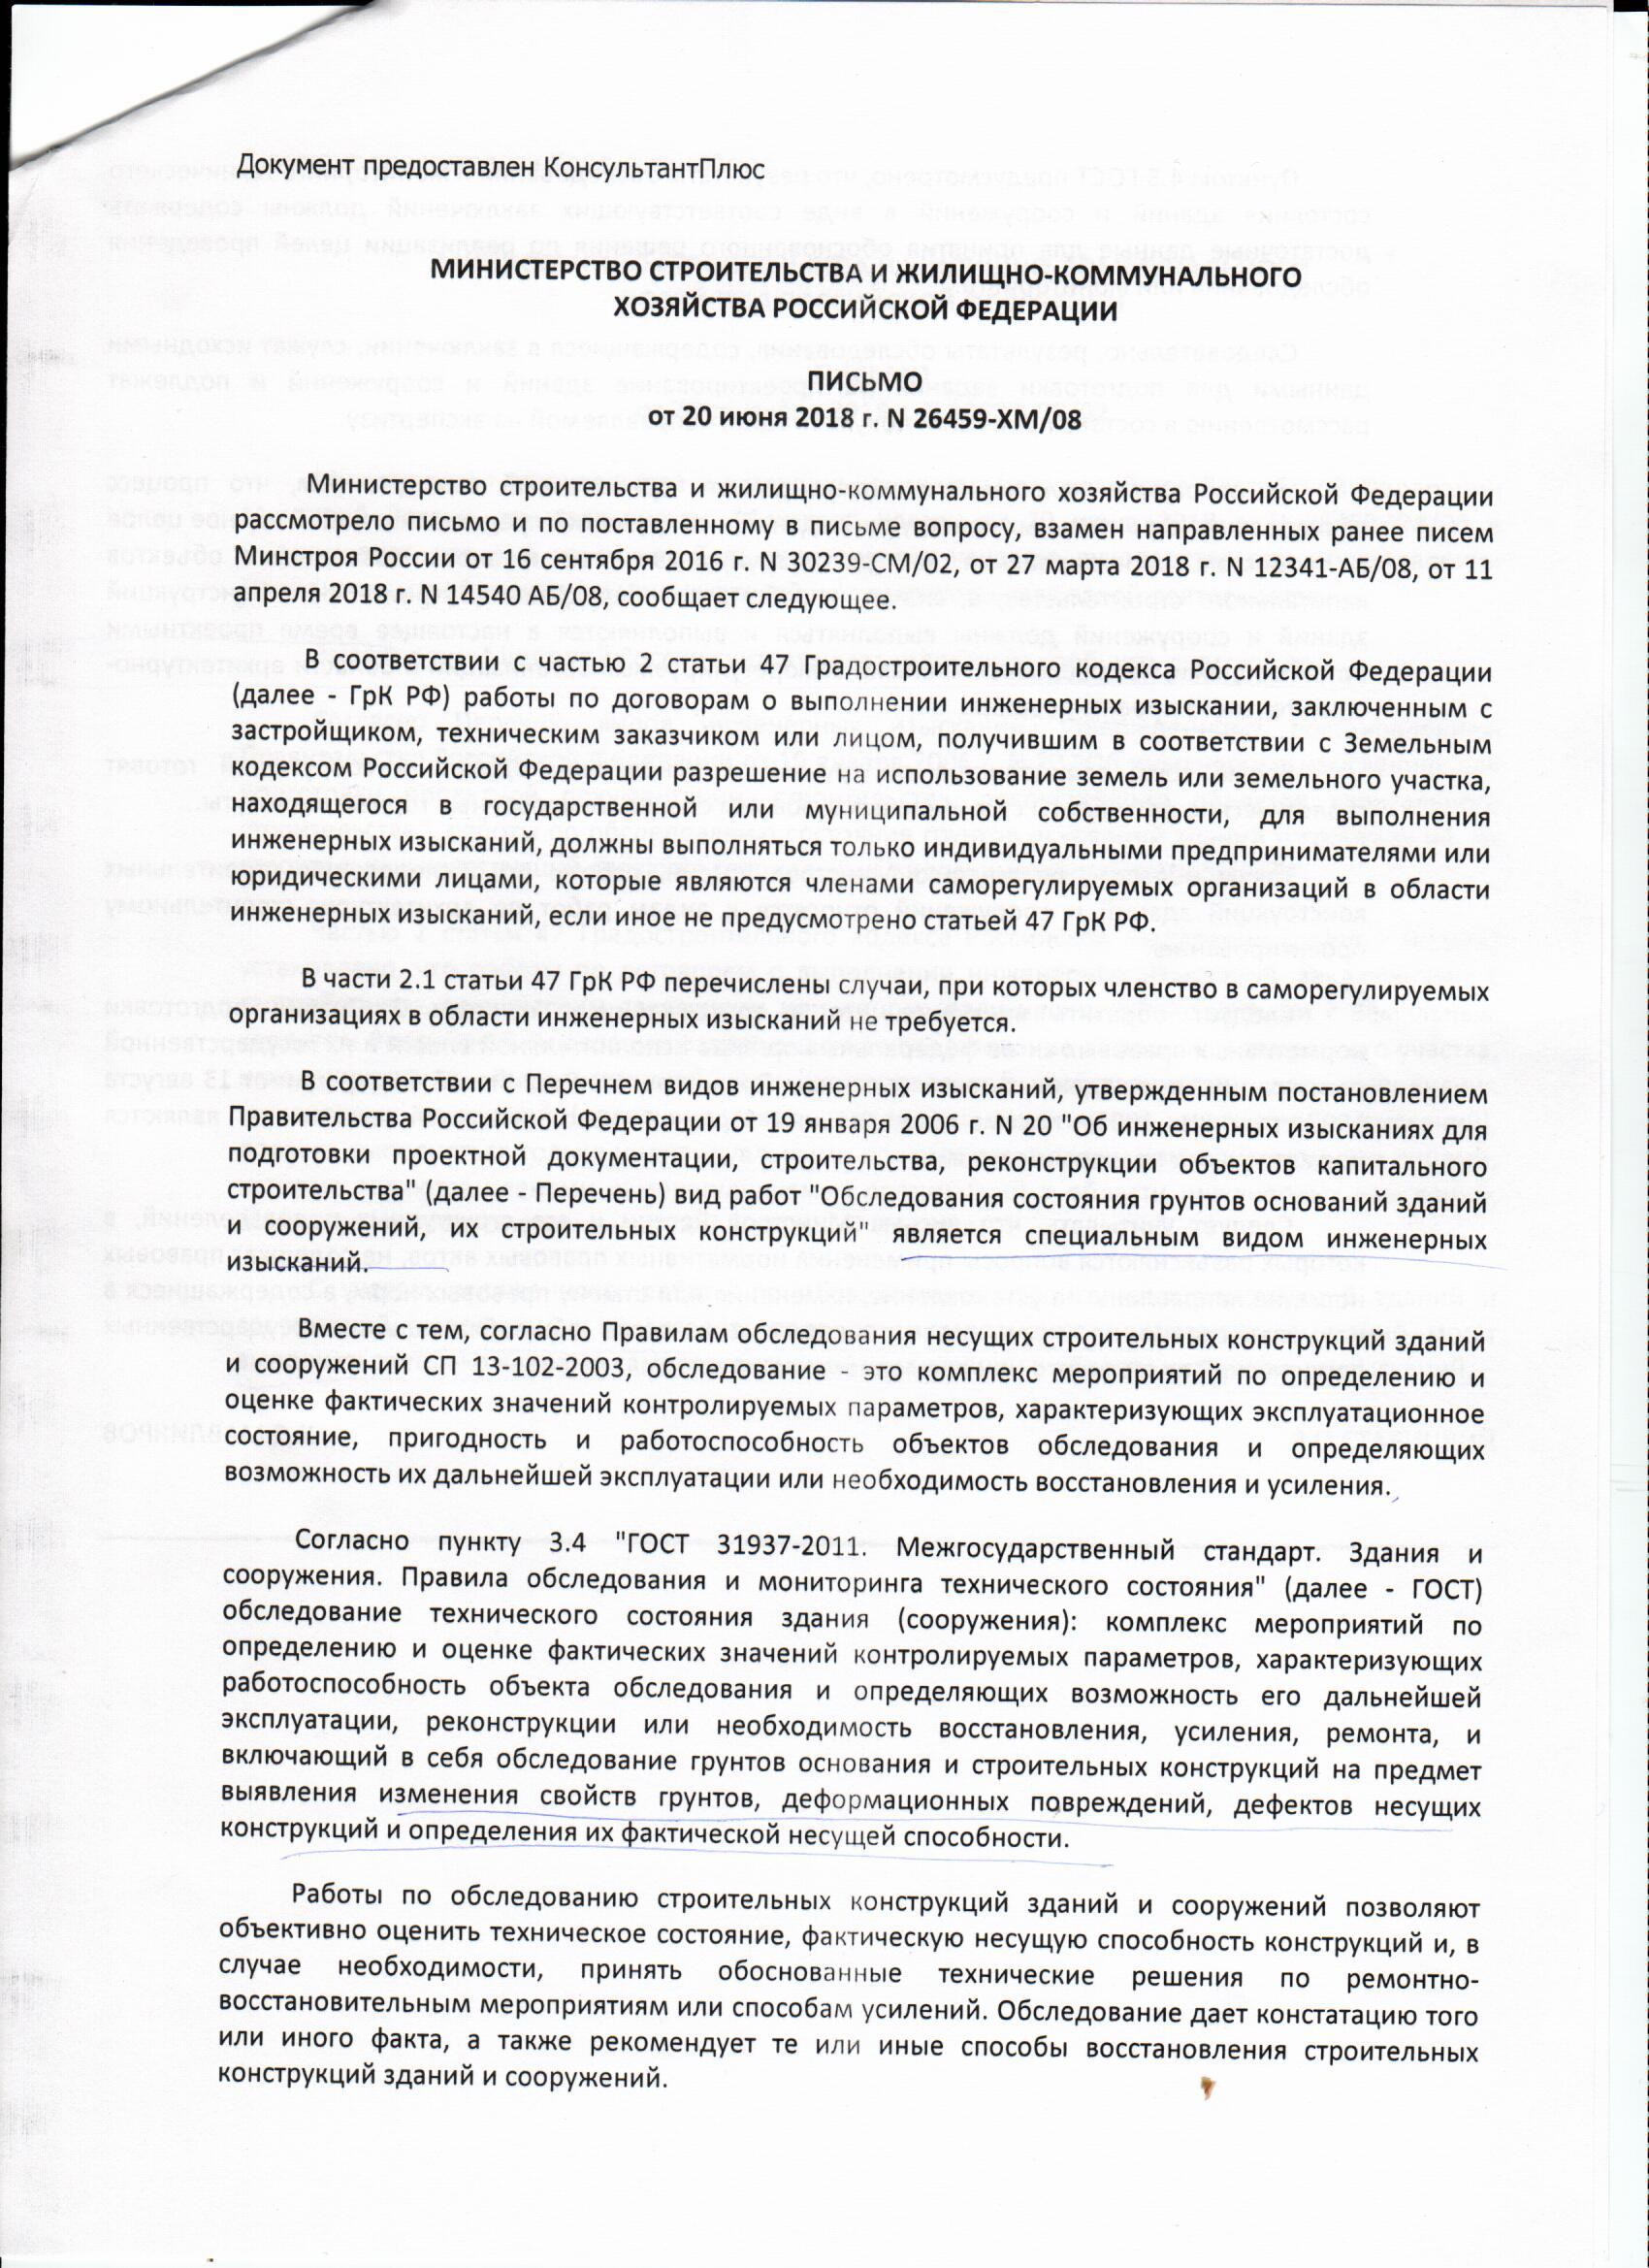 Письмо от 20.06.2018 №26459-ХМ/08